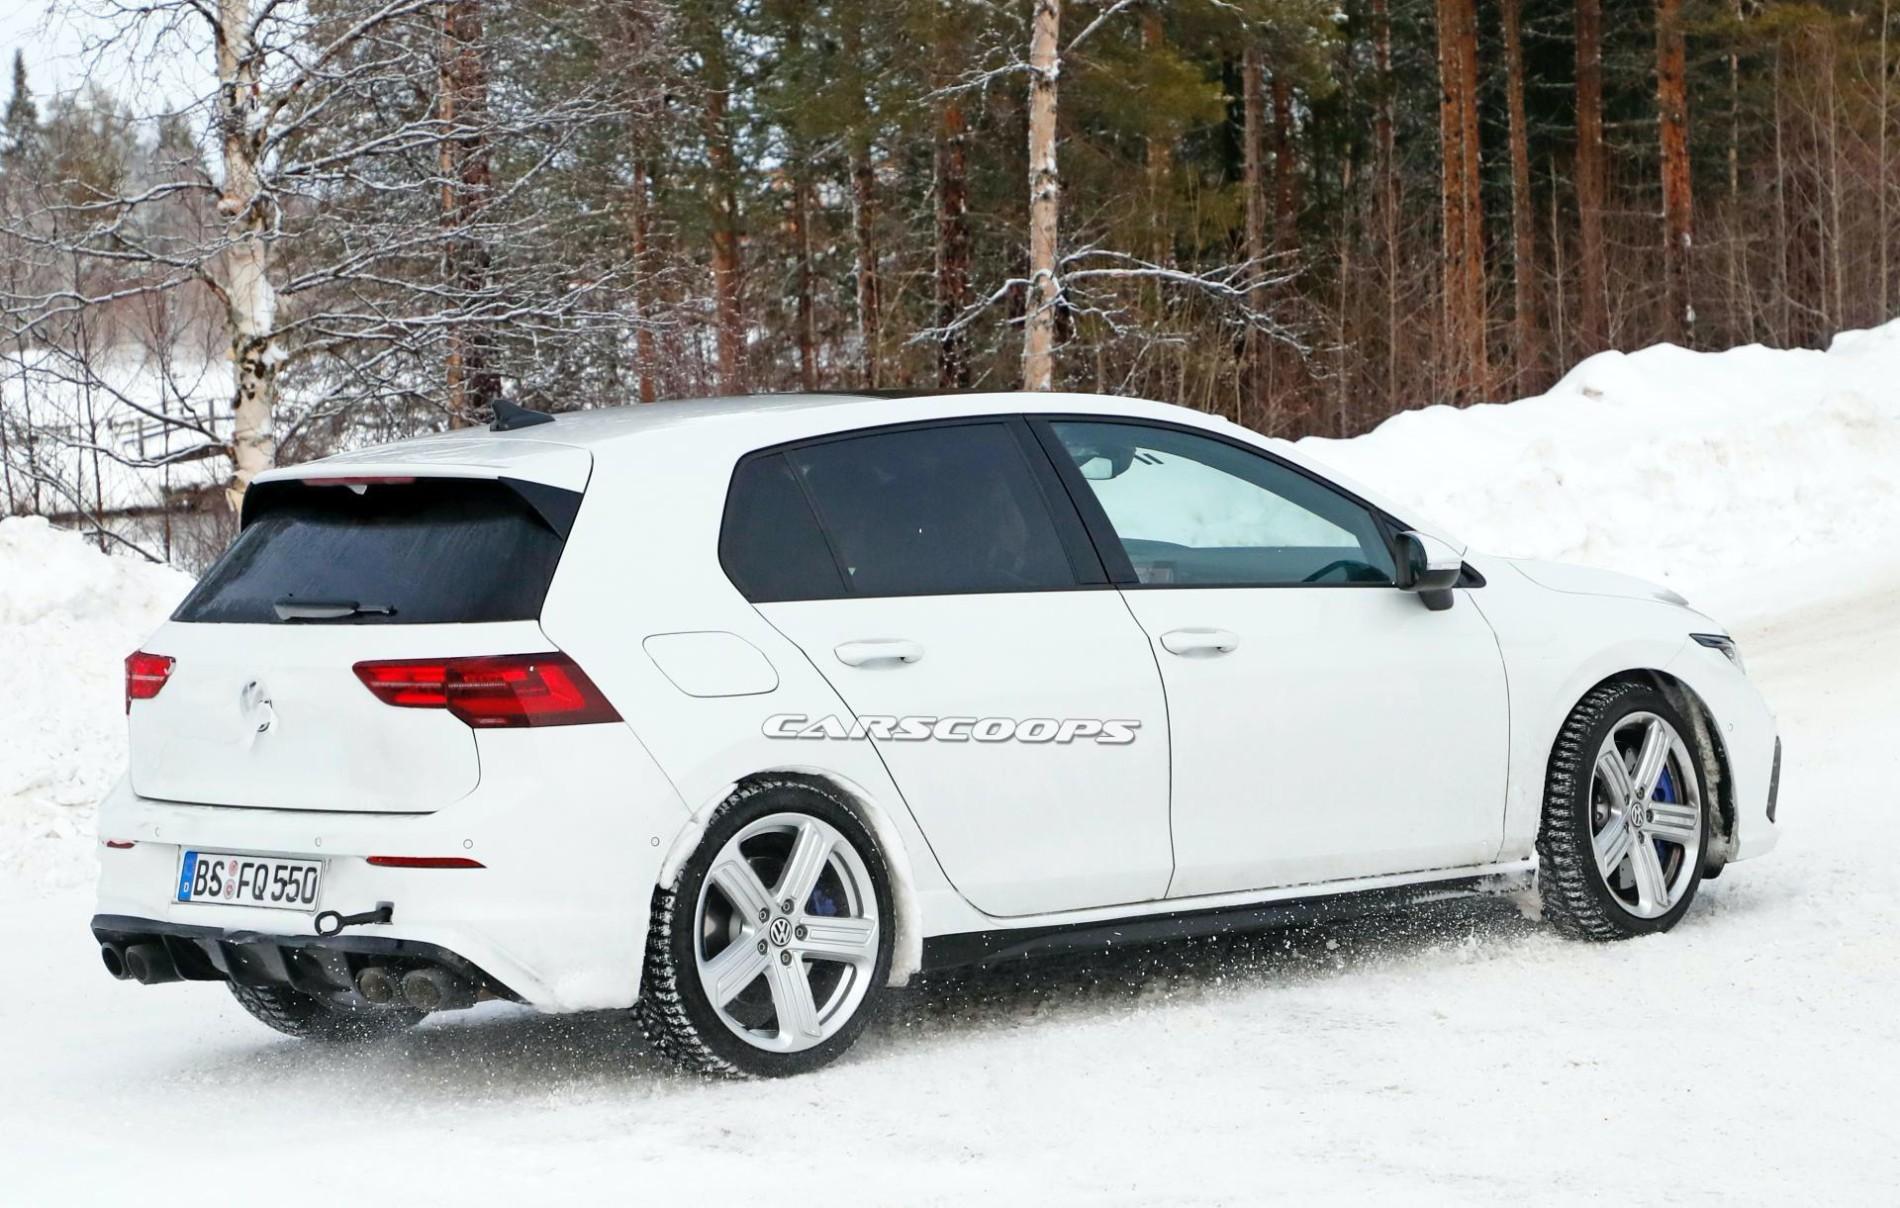 VW Golf R-poze spion - VW Golf R-poze spion